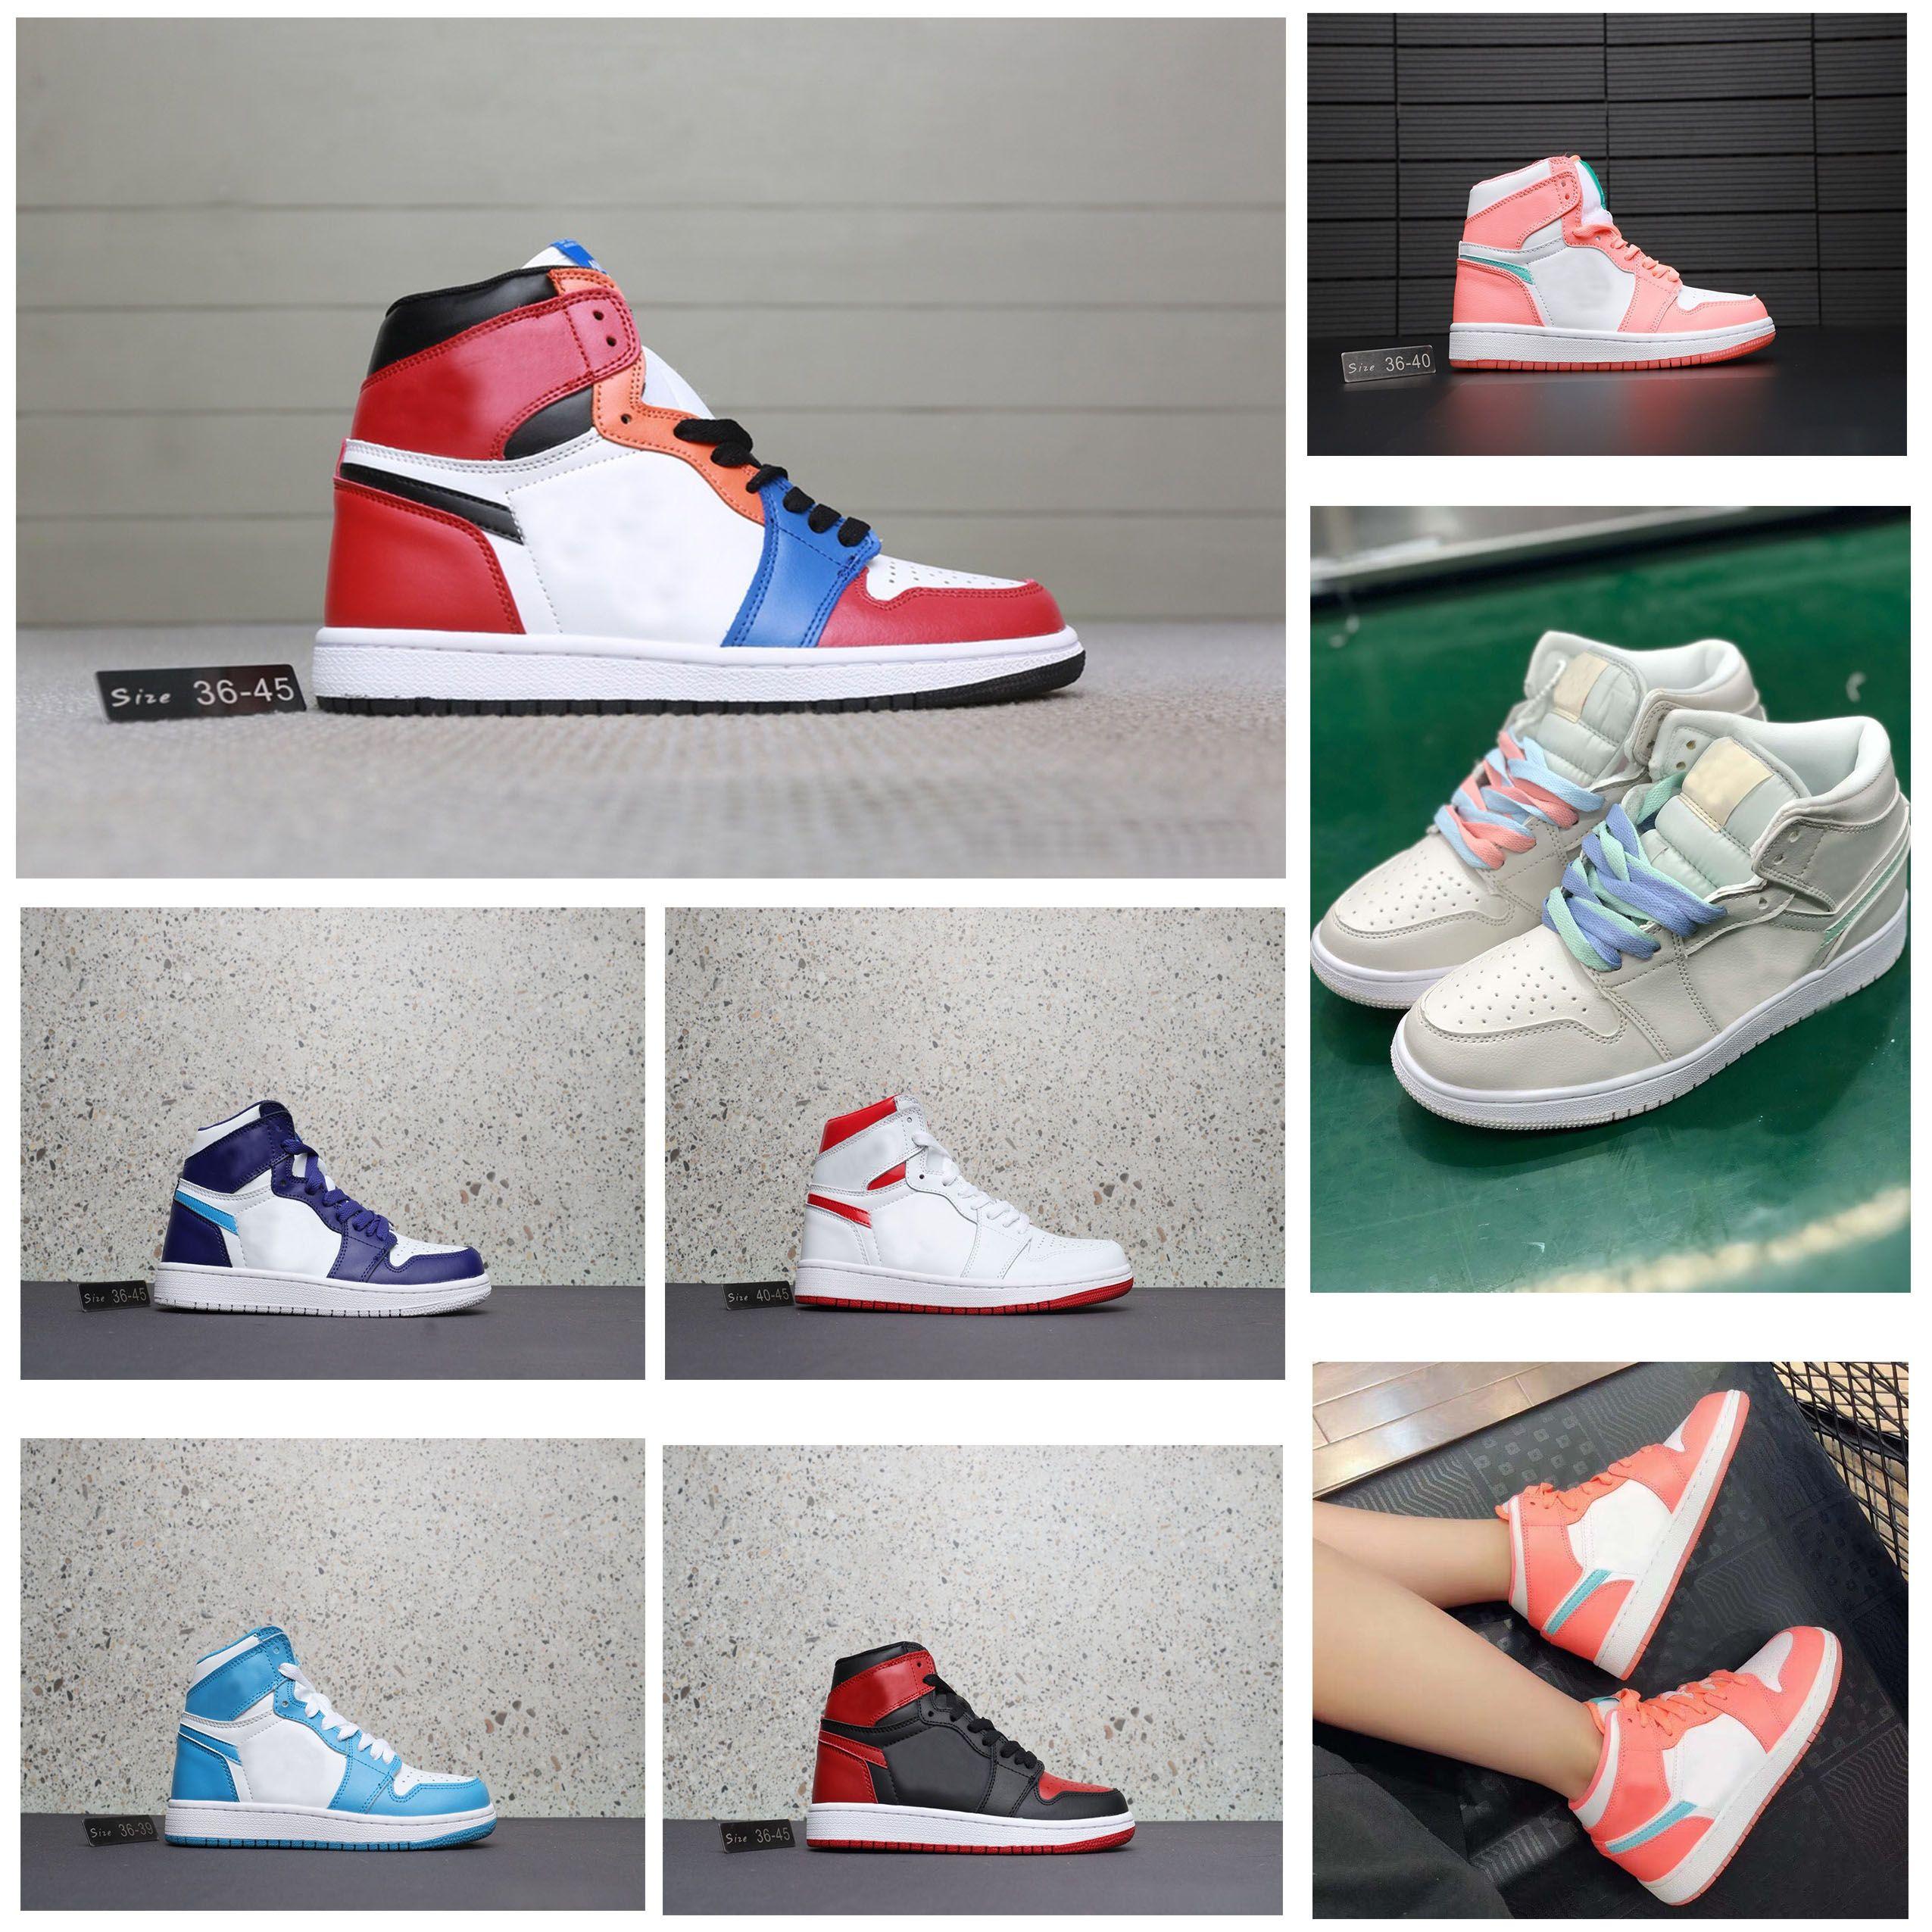 Mens Away Og Designer High Air Duck Nike Marque Jordan Mandarin Brisé Chaussures Top Basketball Shoes Shoes1s Retro Hommes 1 pUMzSVqG